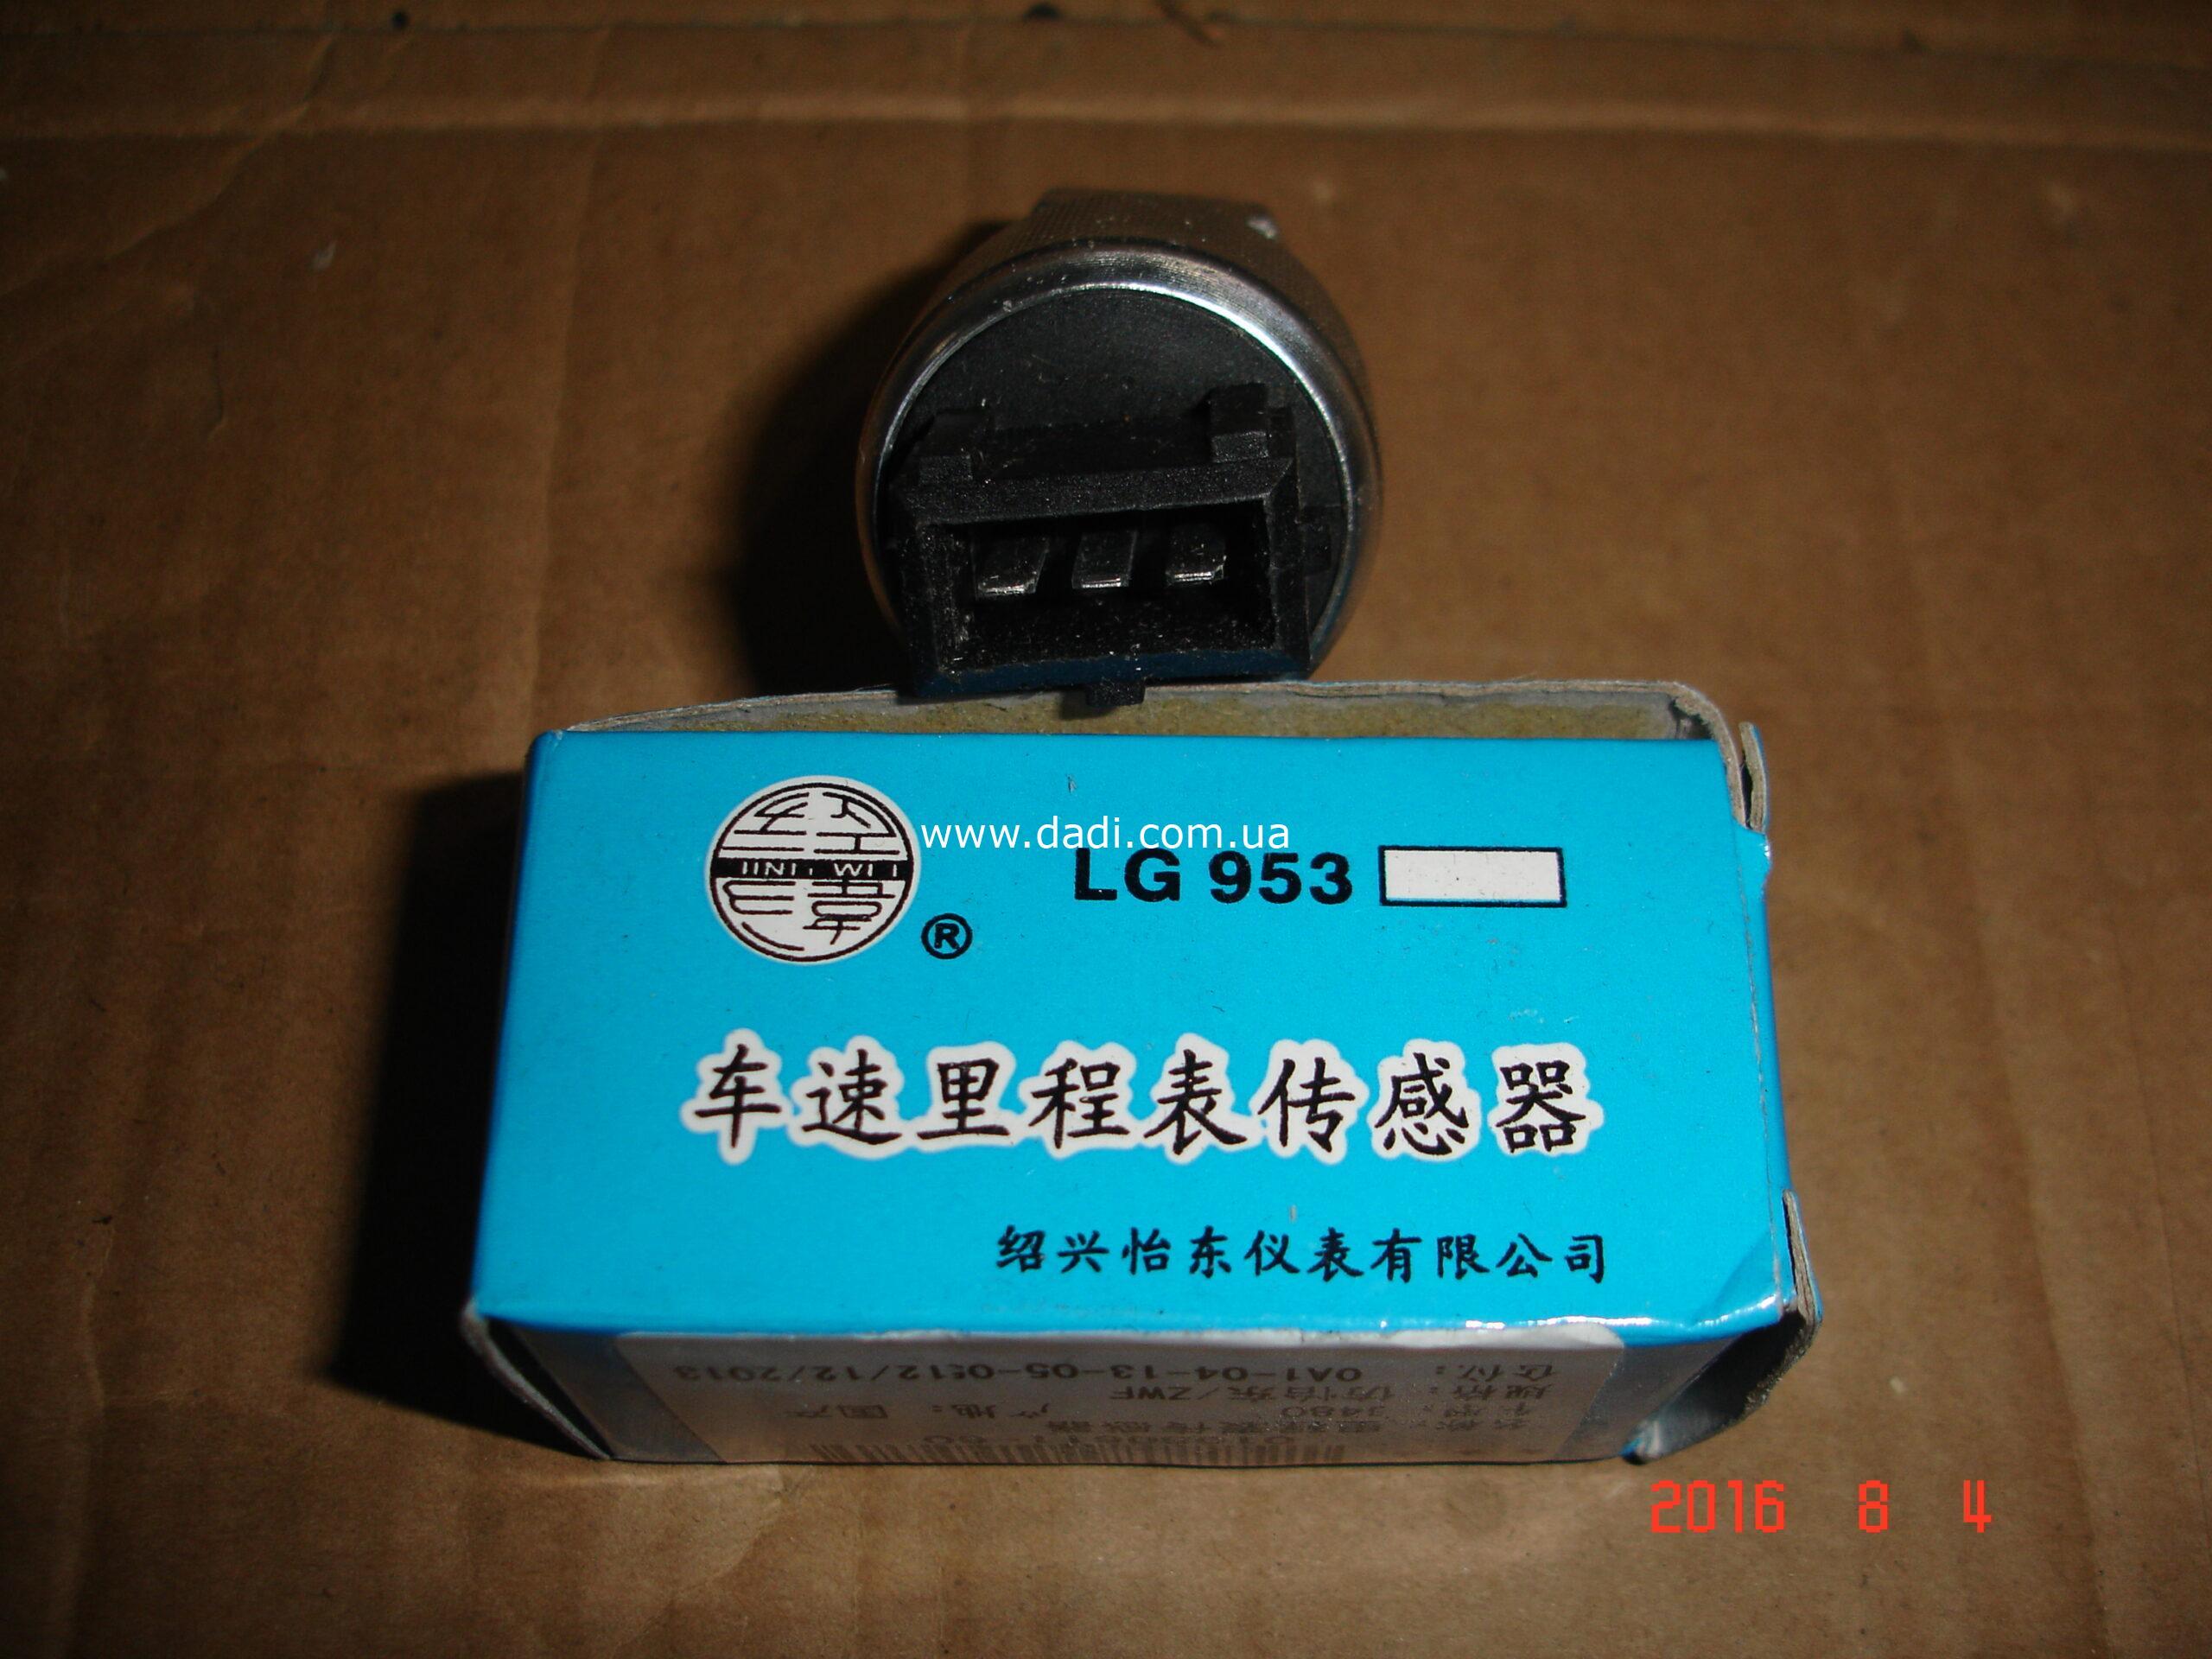 Датчик швидкості/ датчик скорости 5mm DADI-0